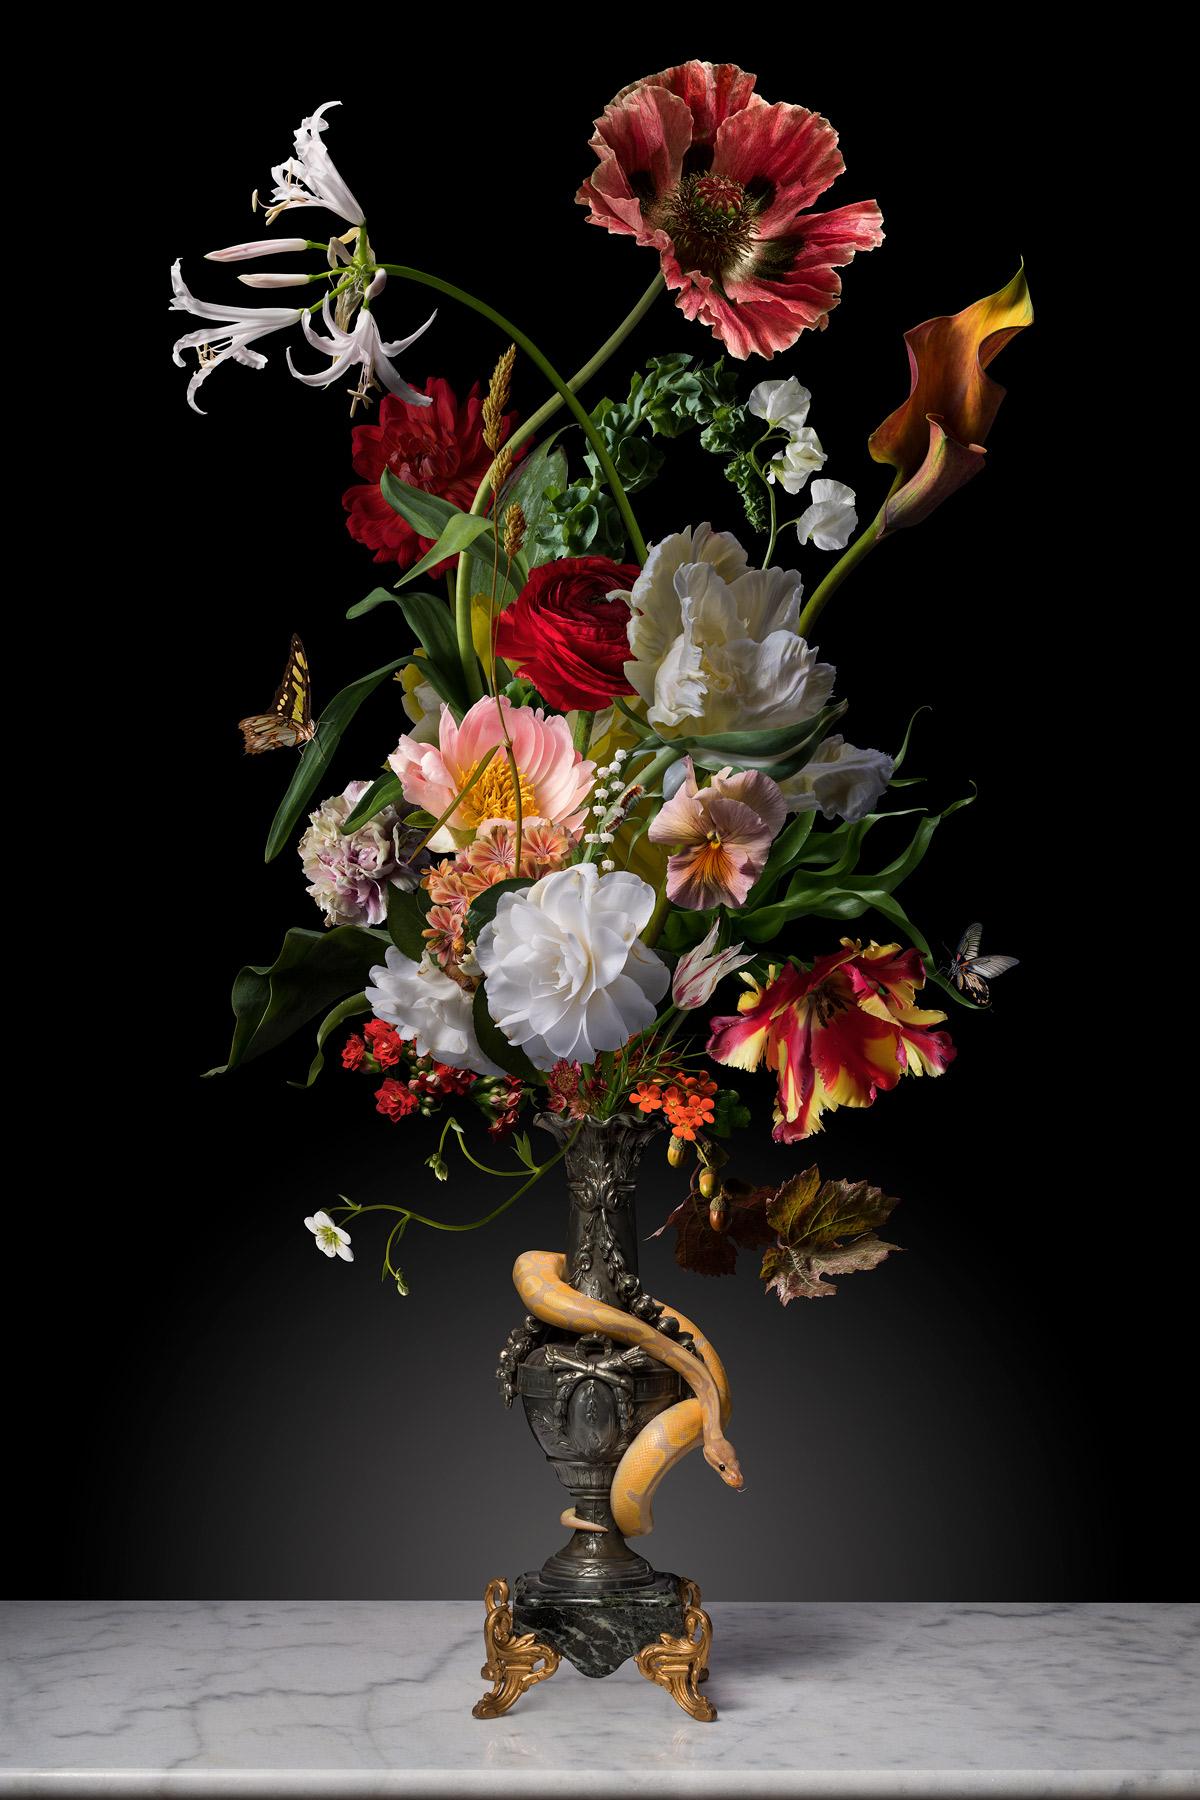 Naga by Julija Levkova